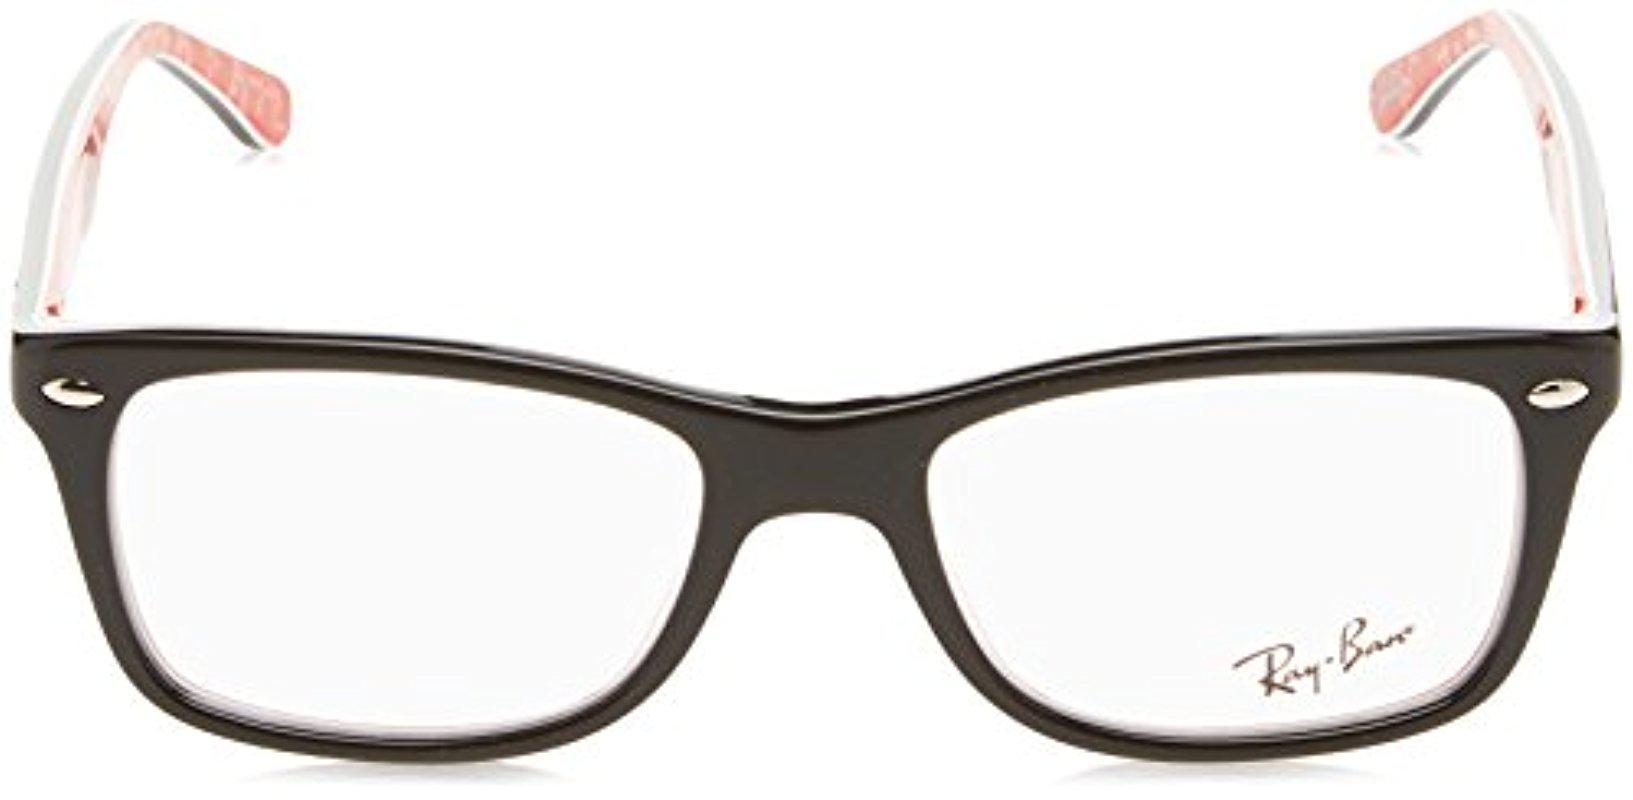 05d35b181b9a Lyst - Ray-Ban Rx 5228 Eyeglasses in Black